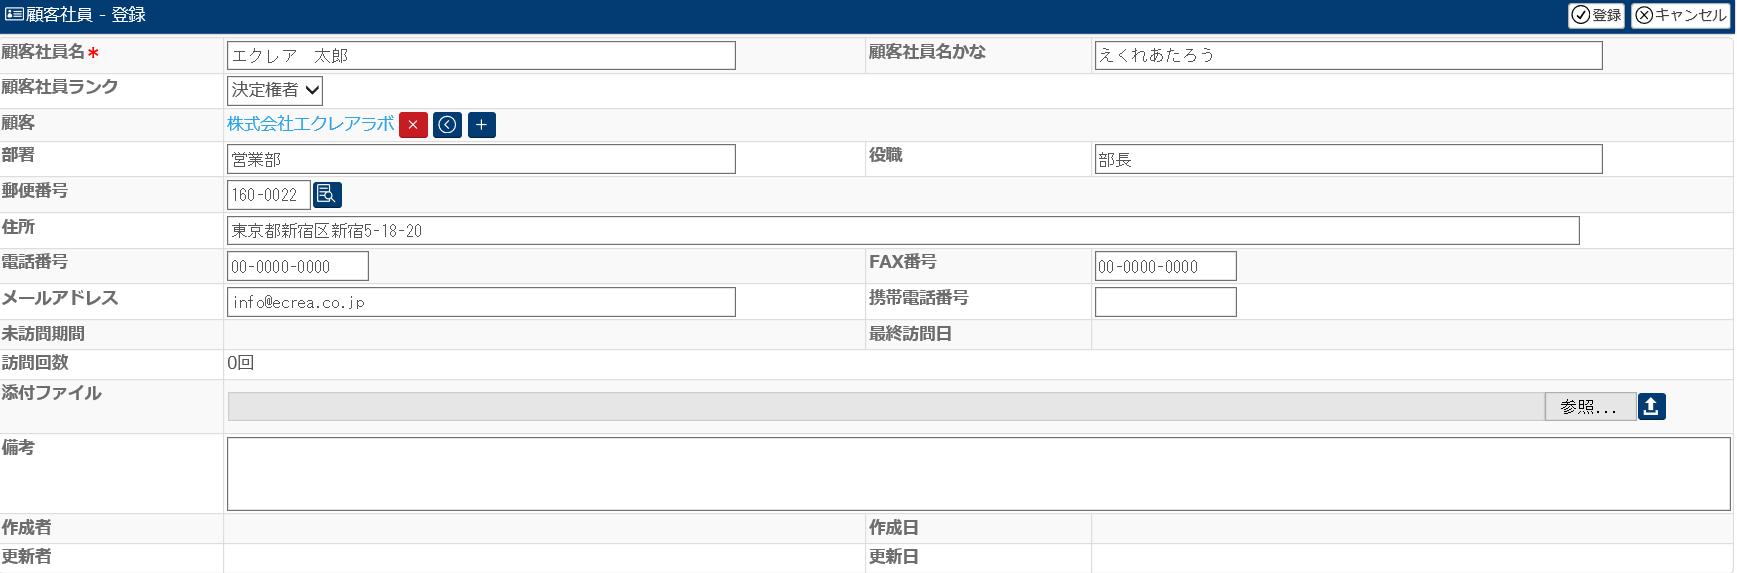 Ecrea顧客社員登録